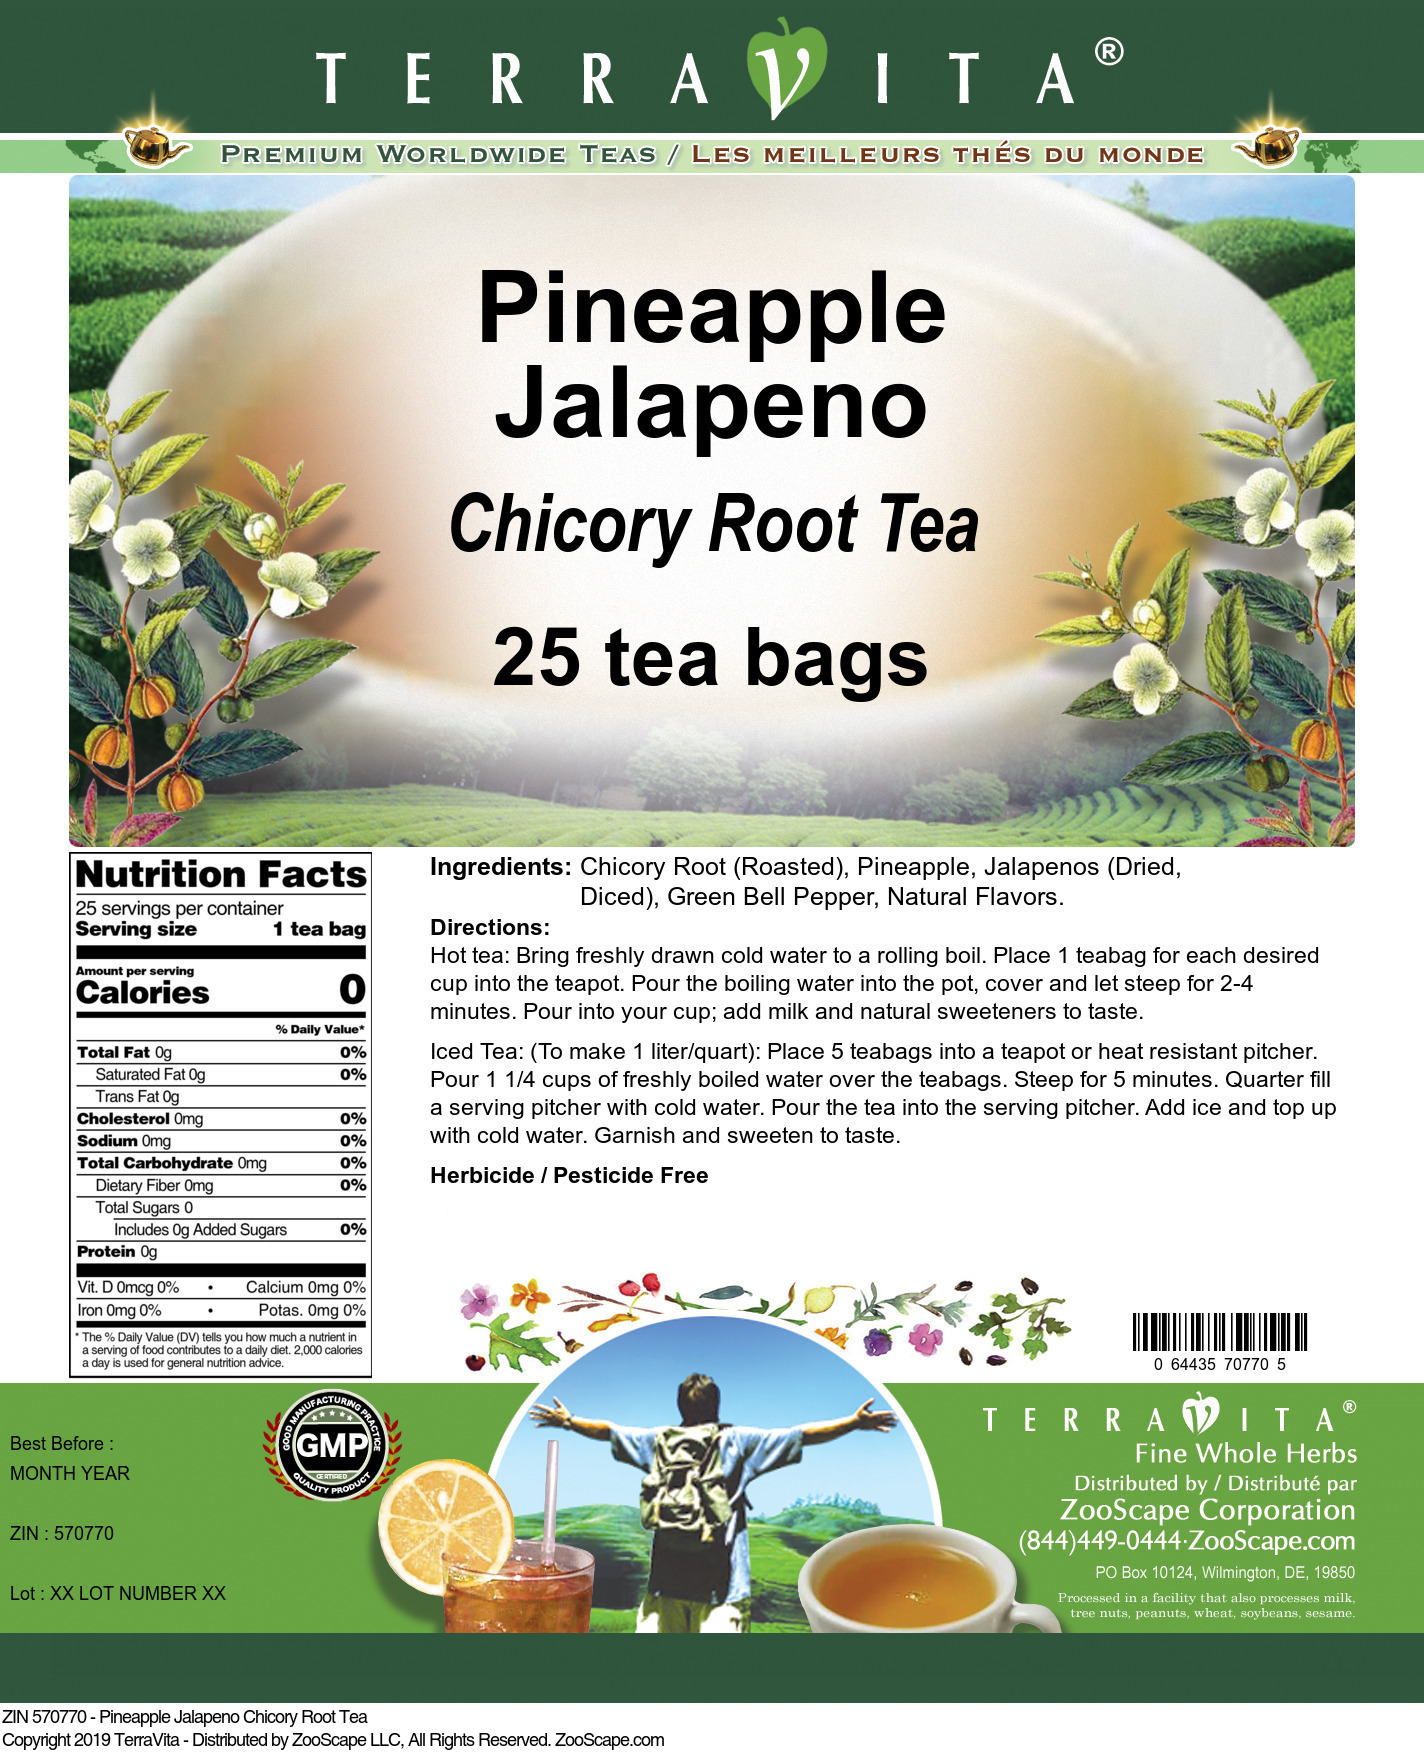 Pineapple Jalapeno Chicory Root Tea